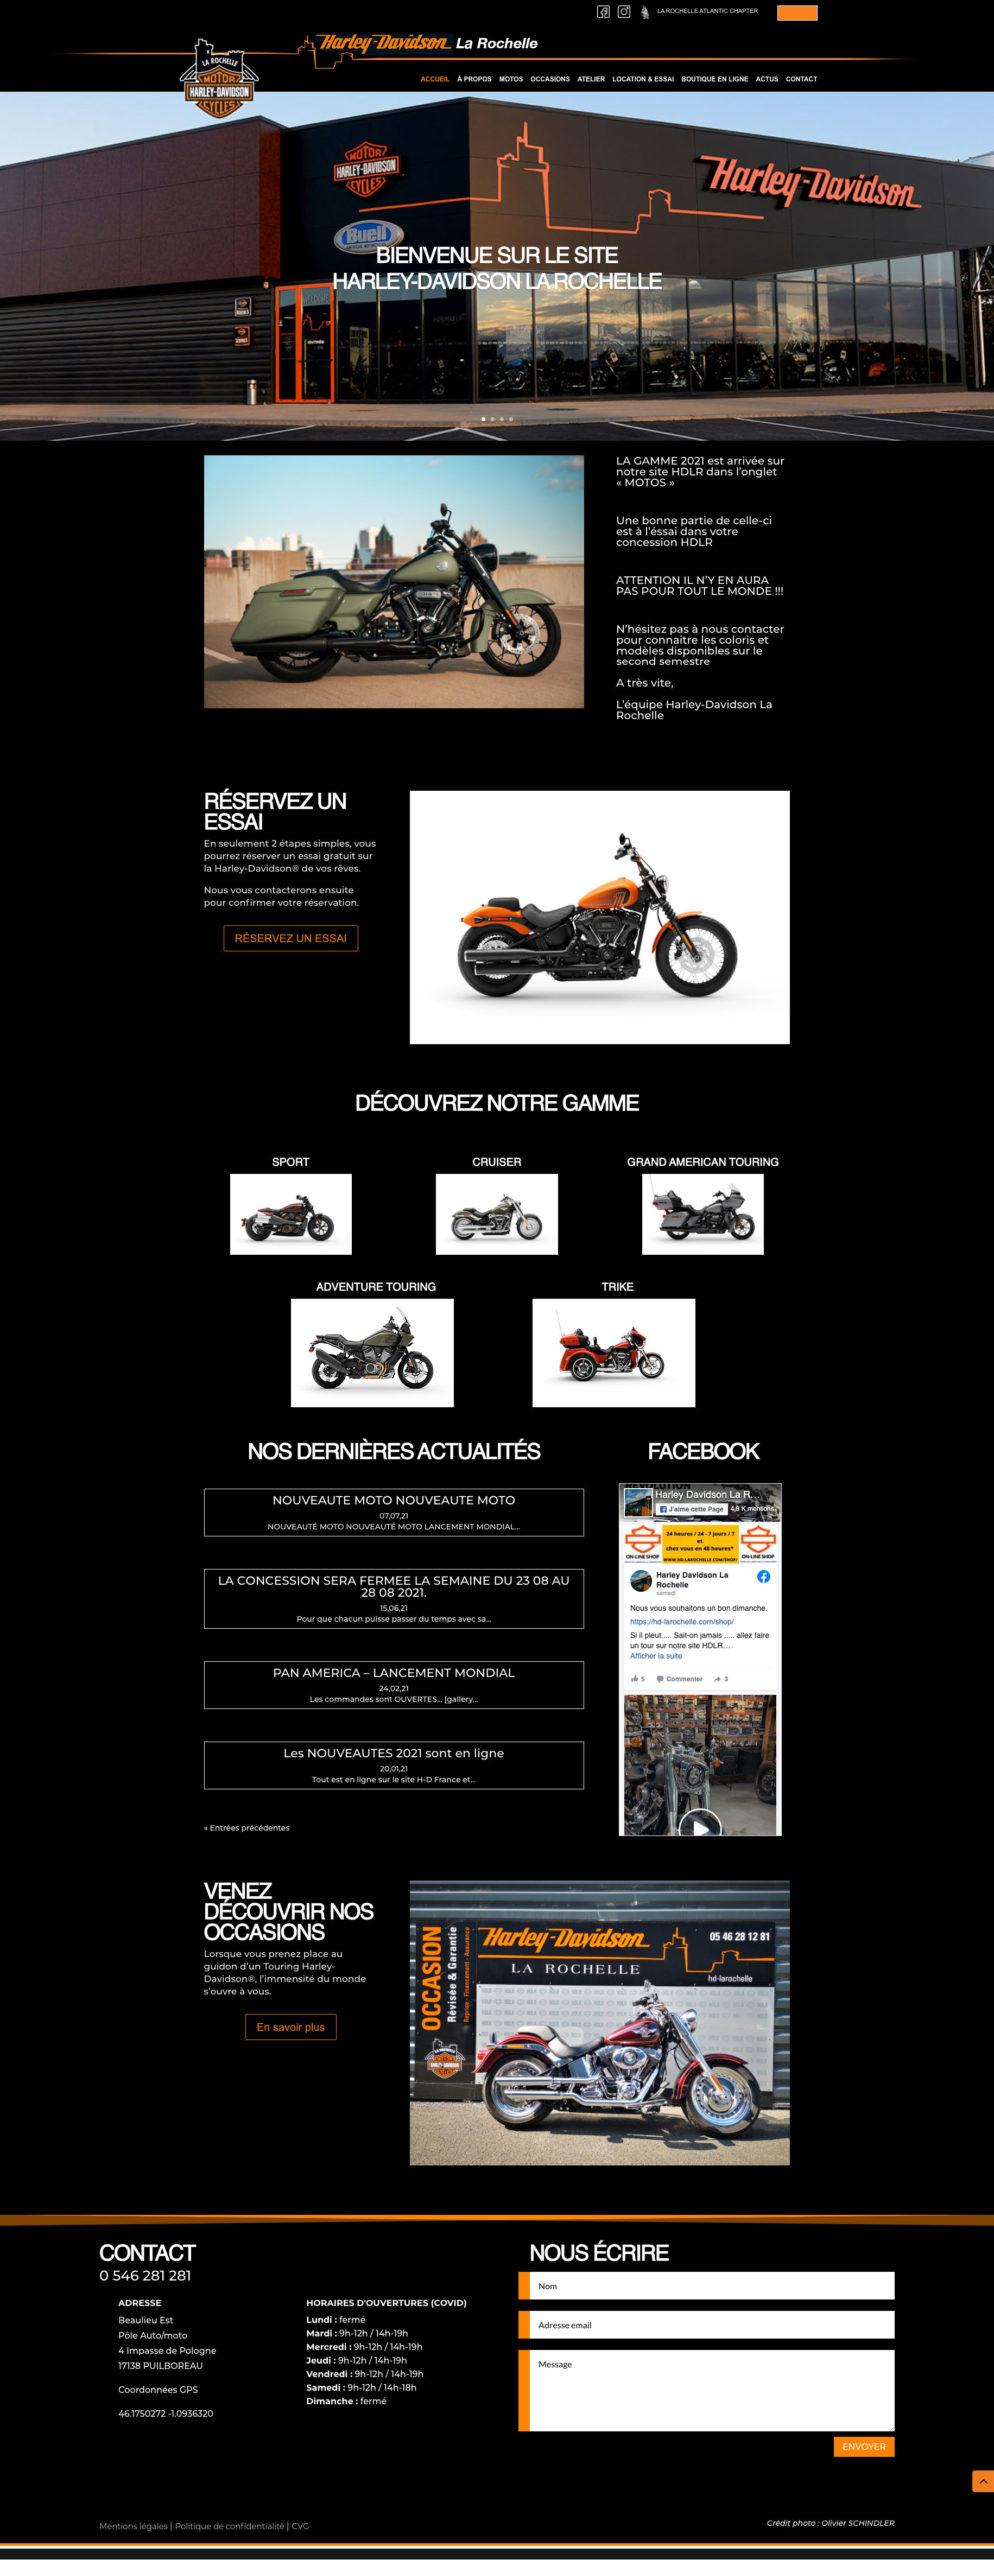 Harley Davidson La Rochelle